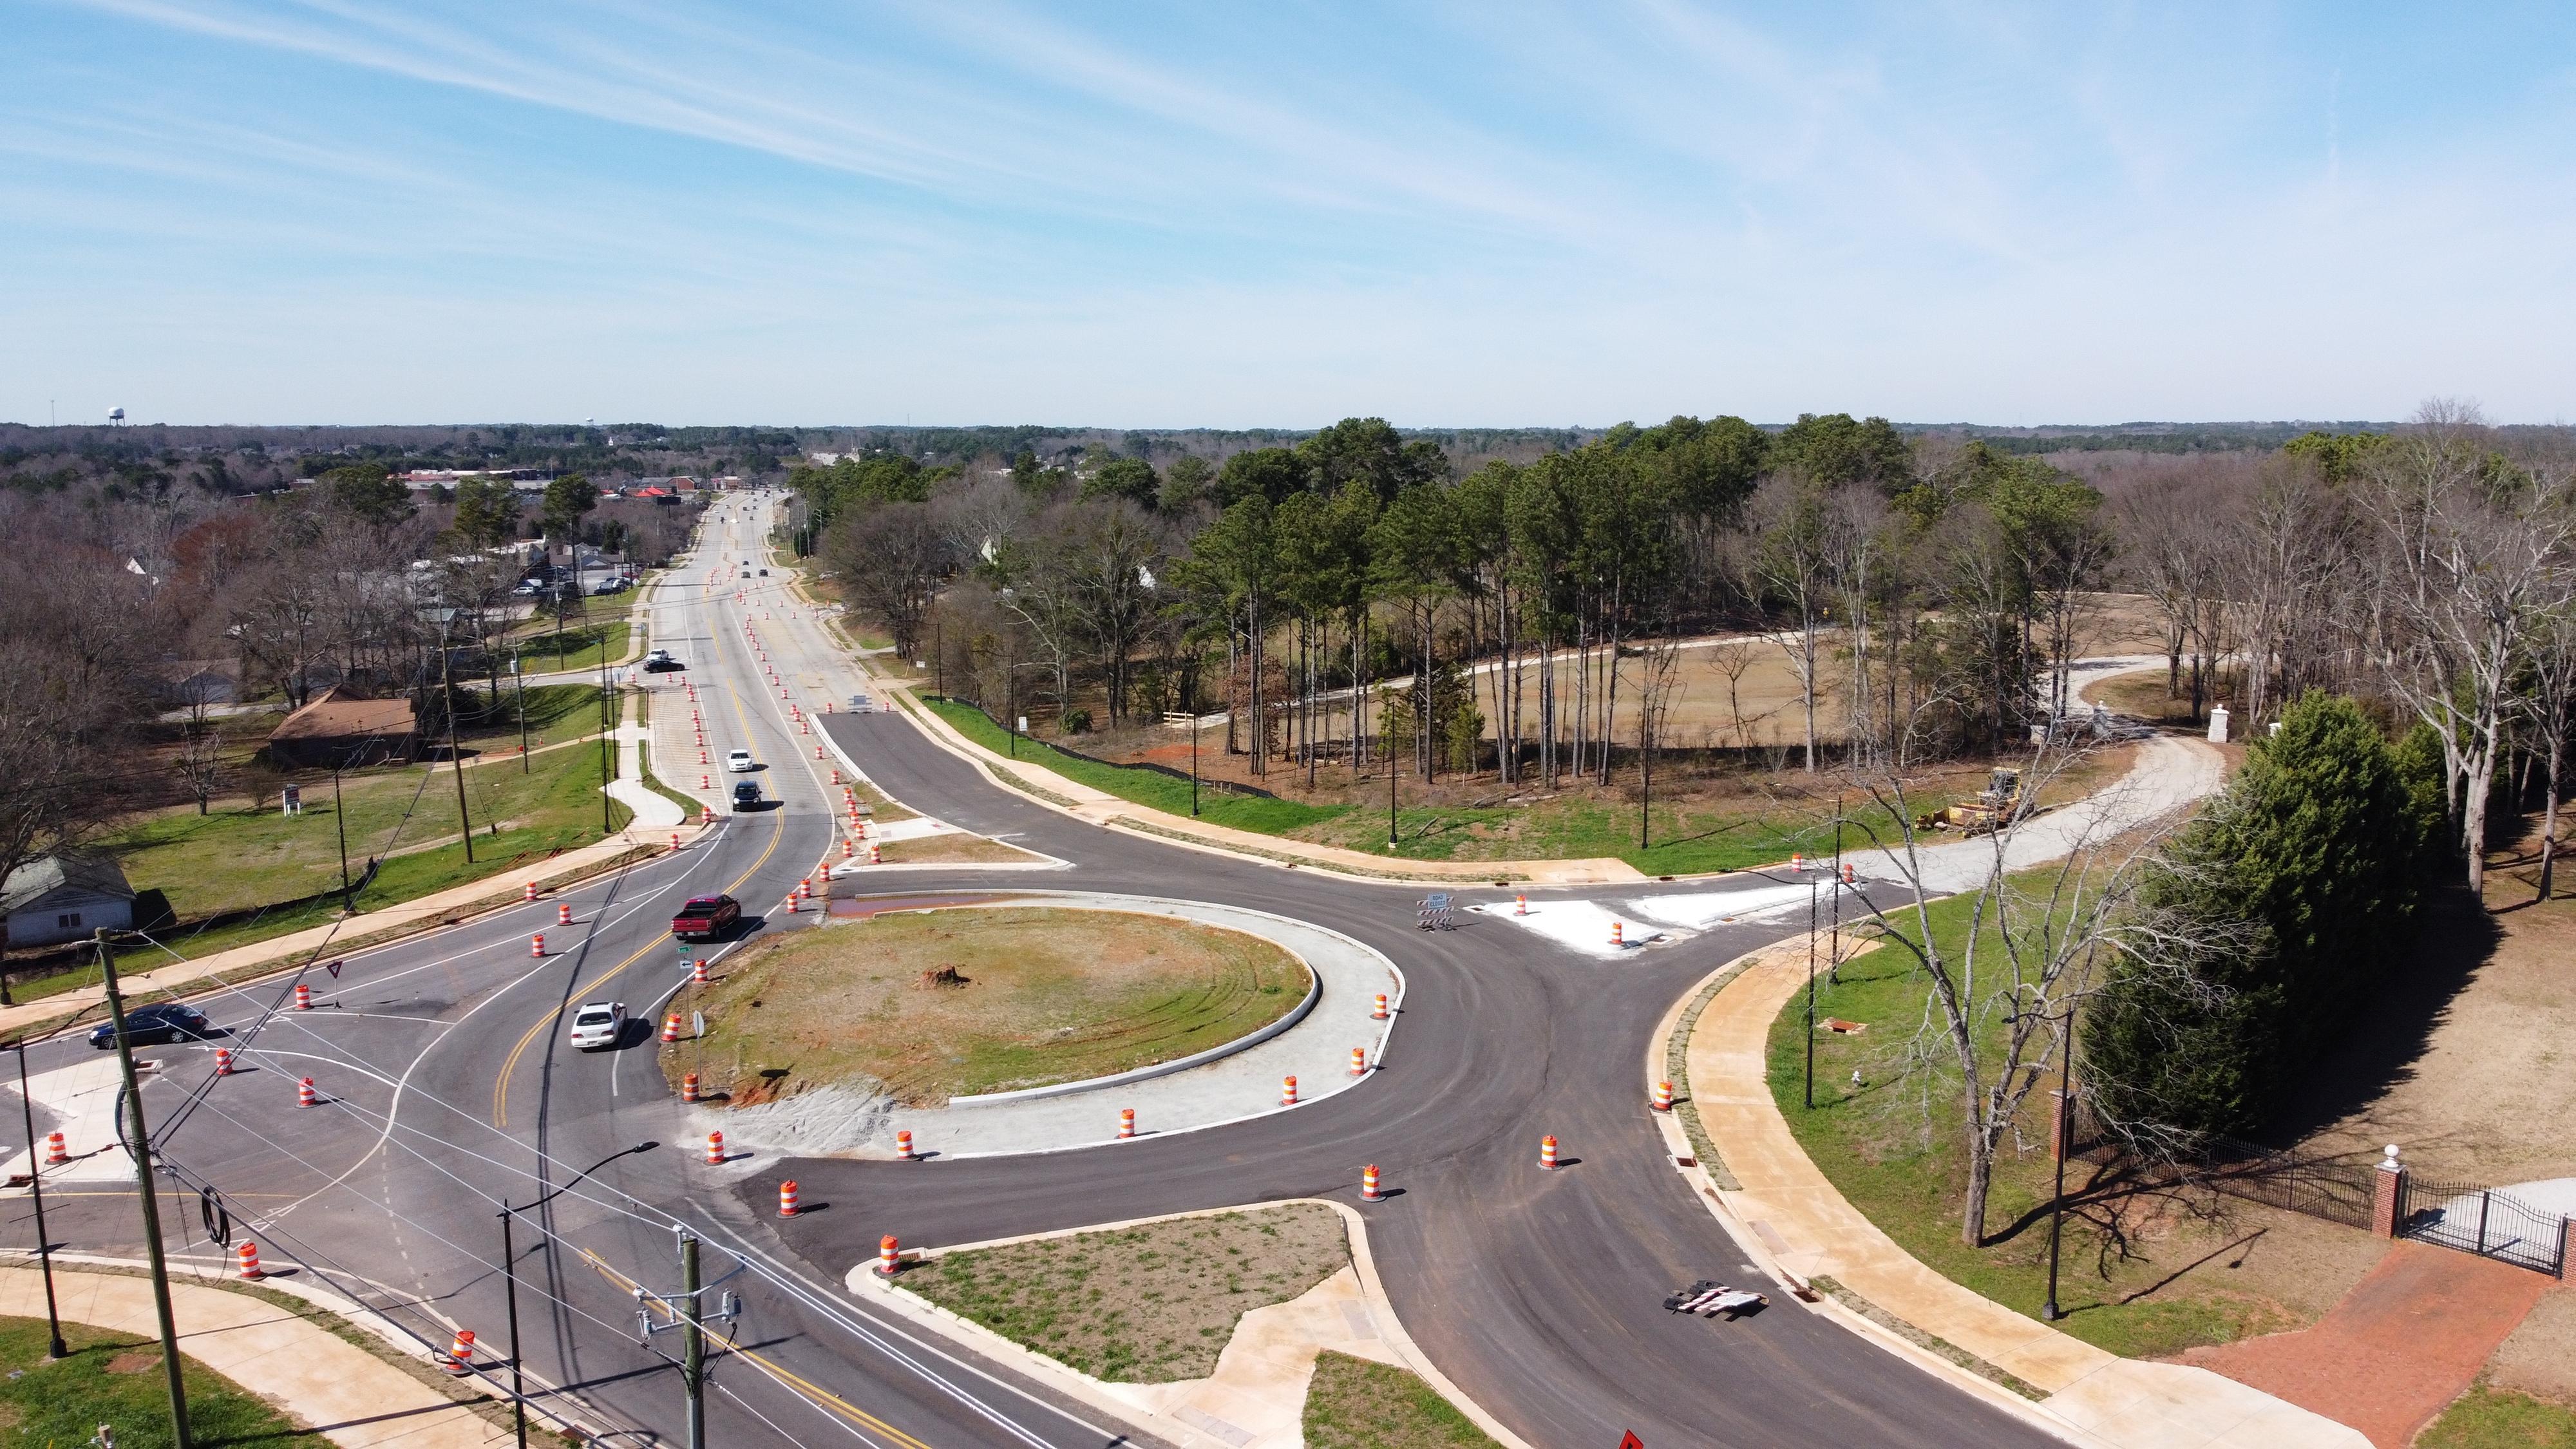 Drone photo of Jonesboro Road at Doris Street roundabout under construction in February 2020 (staff photo)